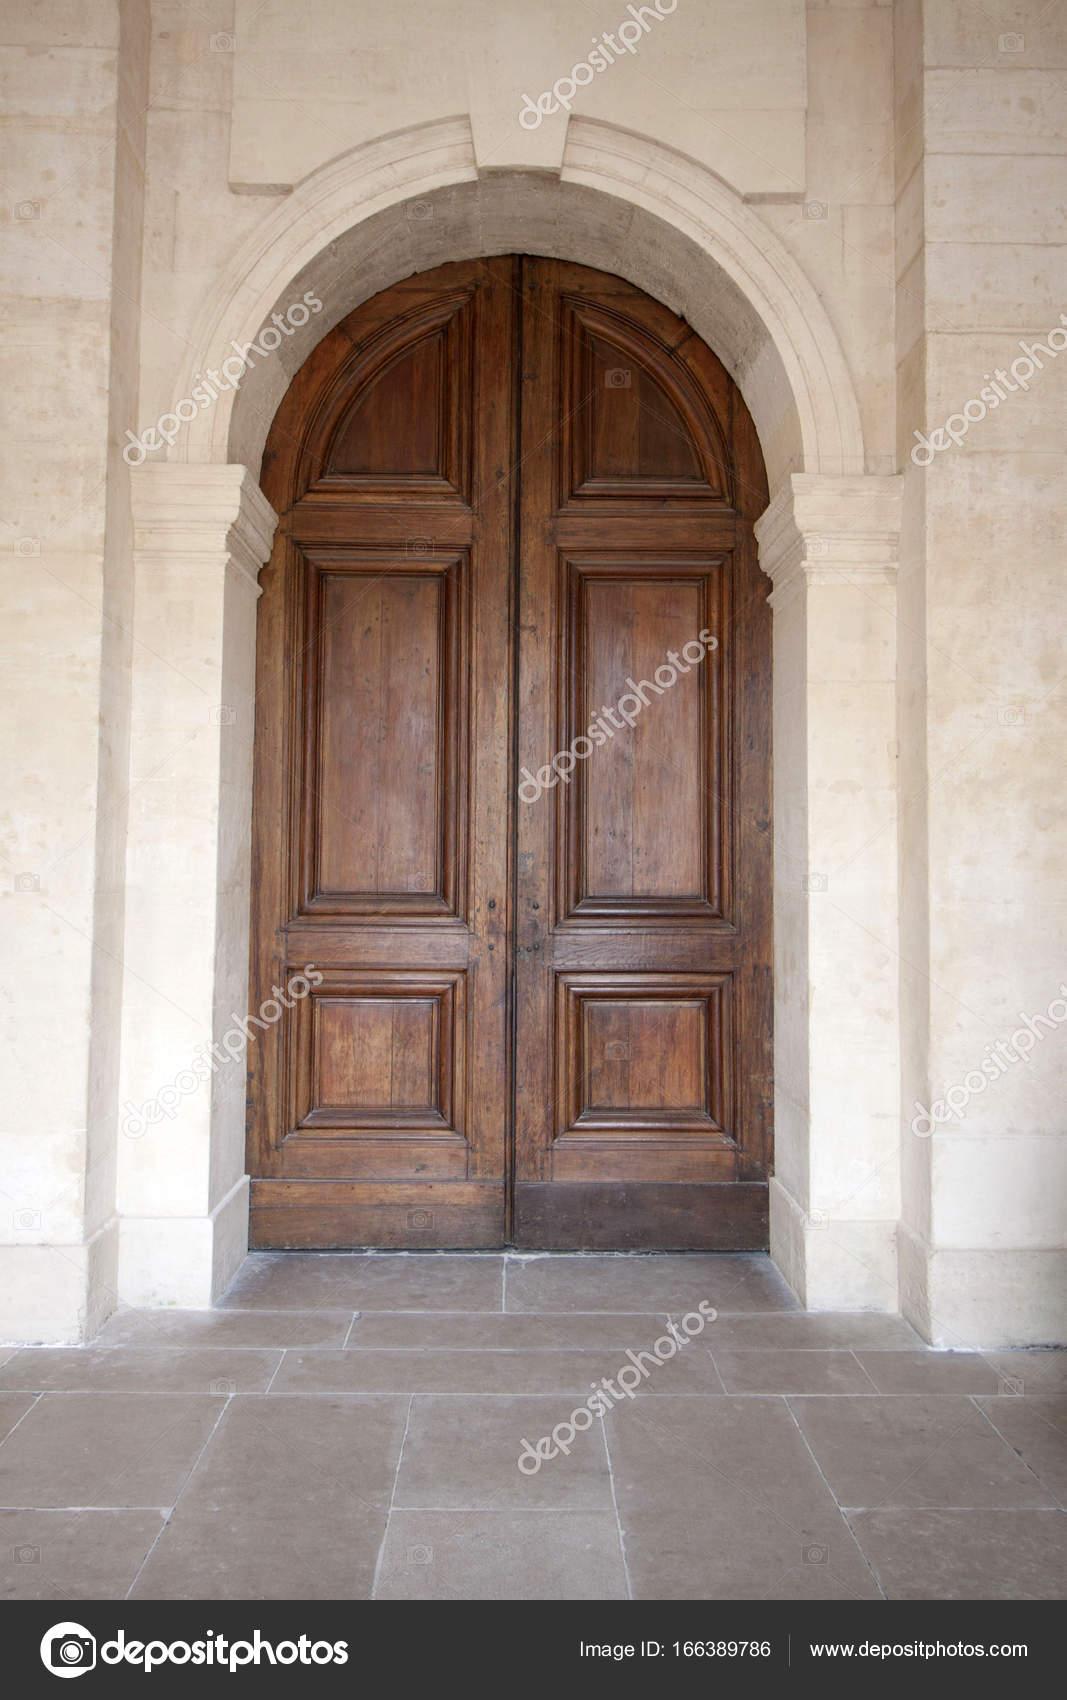 Fotos Puertas De Madera Principales Puerta Madera Antigua Iglesia